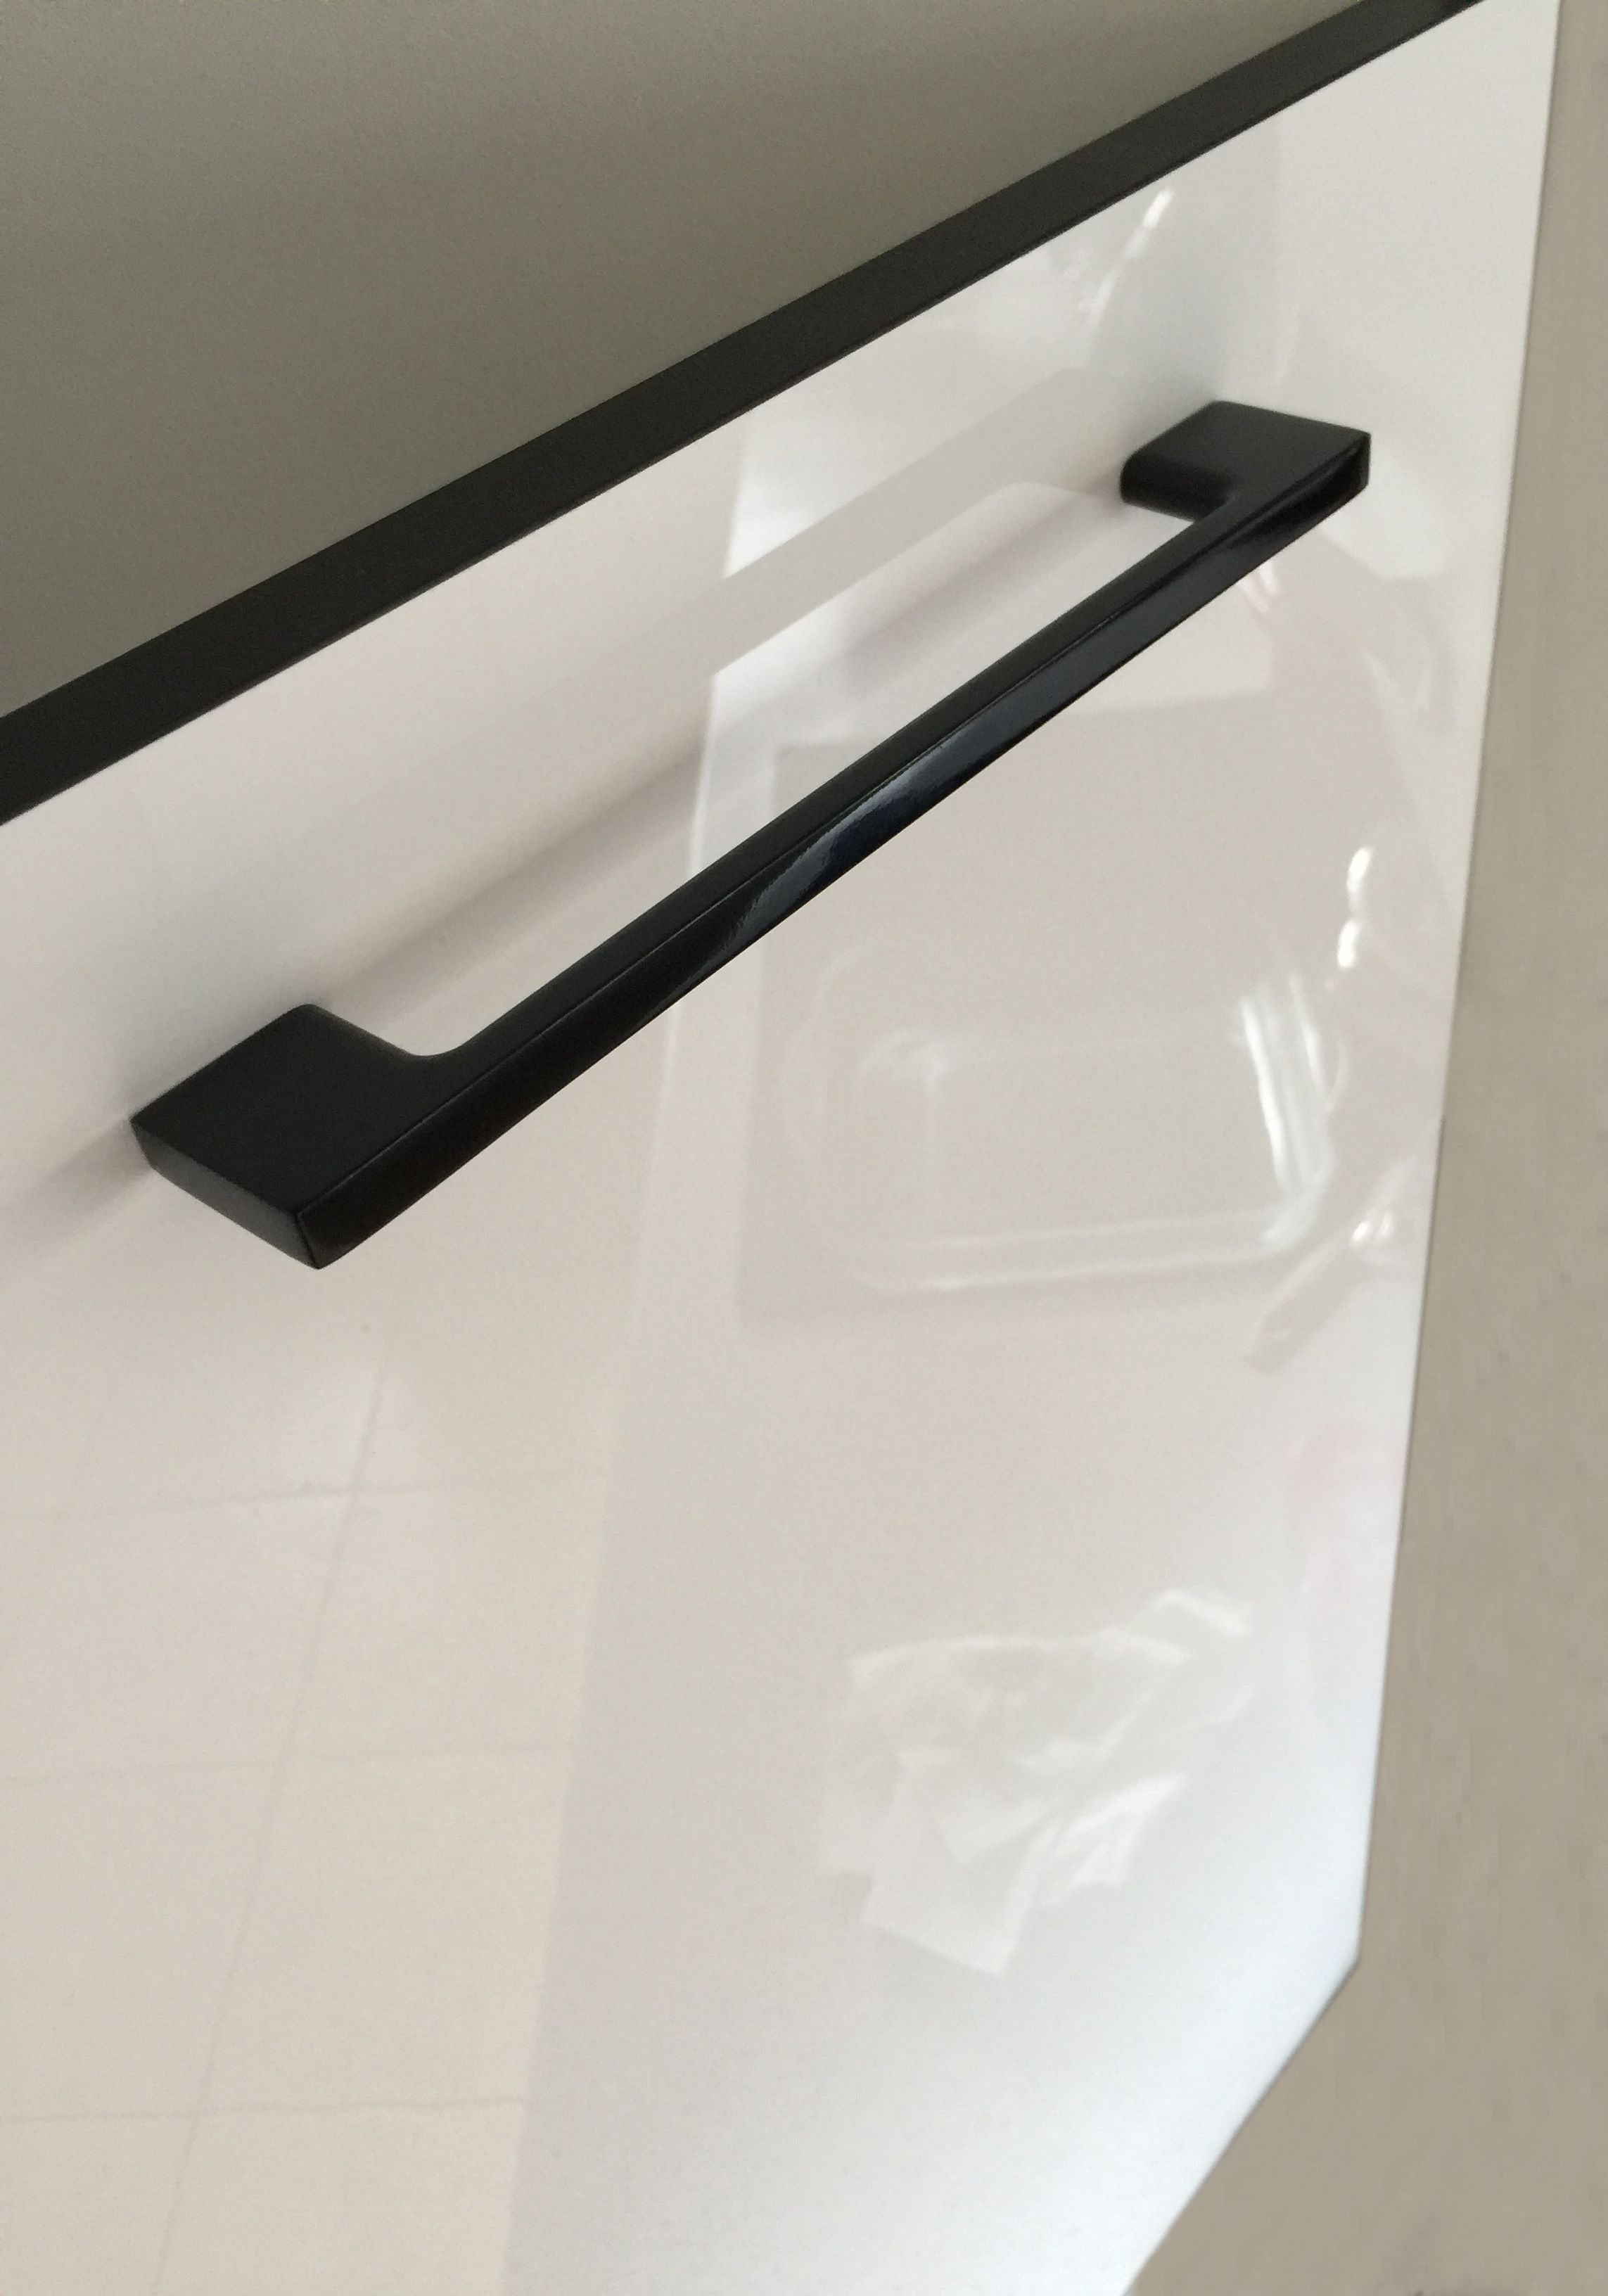 Download Wallpaper White Kitchen Unit Handles